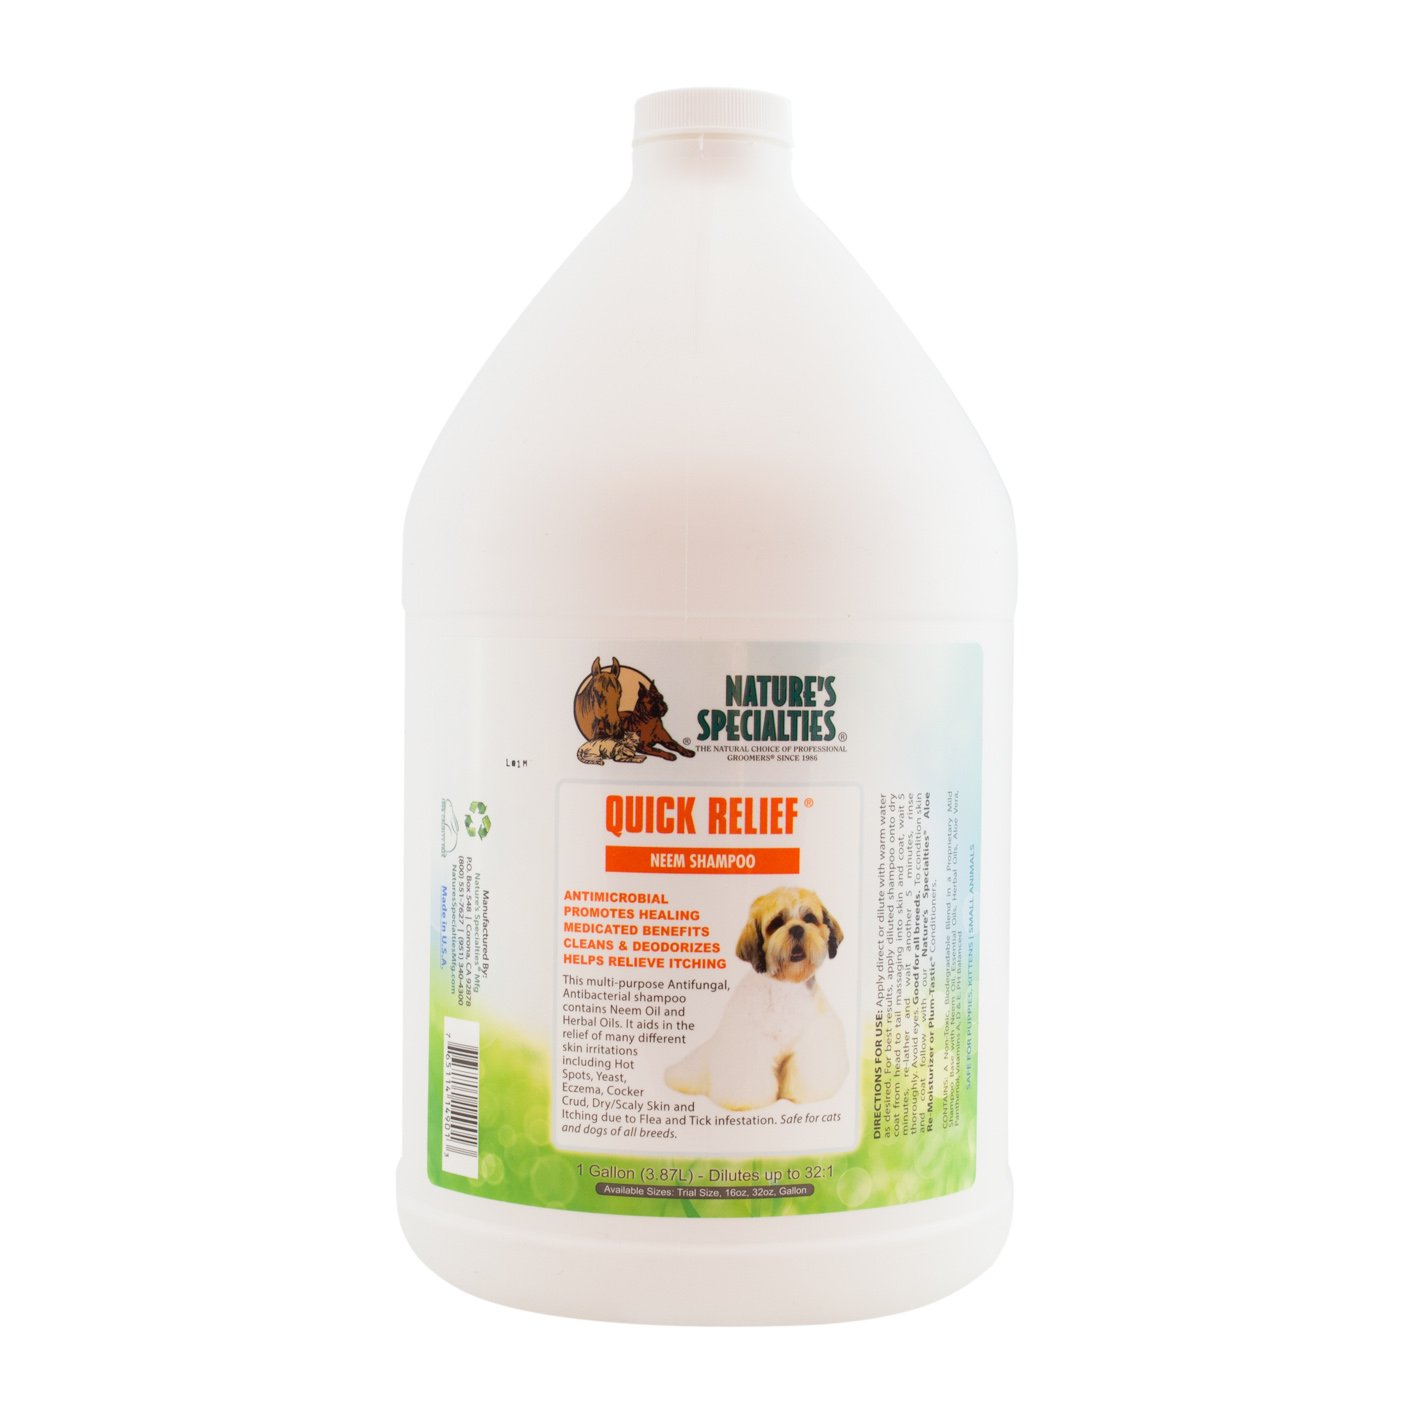 Nature's Specialties Quick Relief Neem Shampoo for Pets by Nature's Specialties Mfg